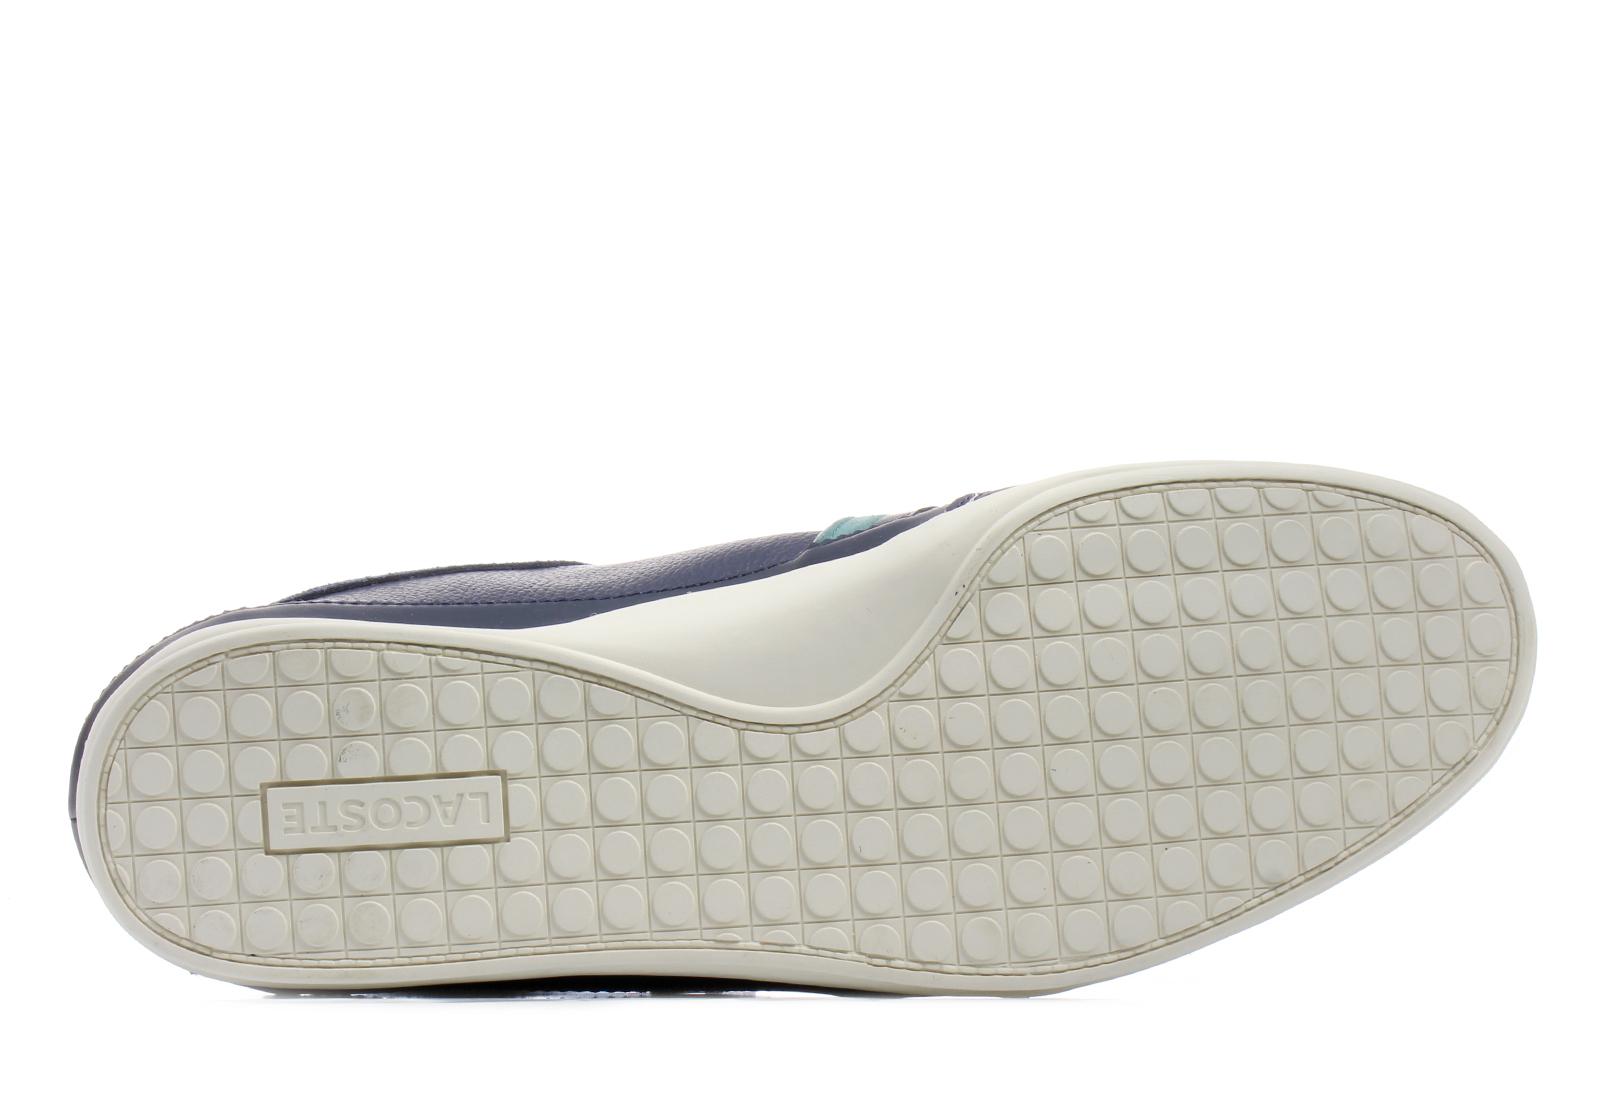 Lacoste Shoes - Misano 118 1 - 181cam0080-2s3 - Online shop for ... ac0efda383